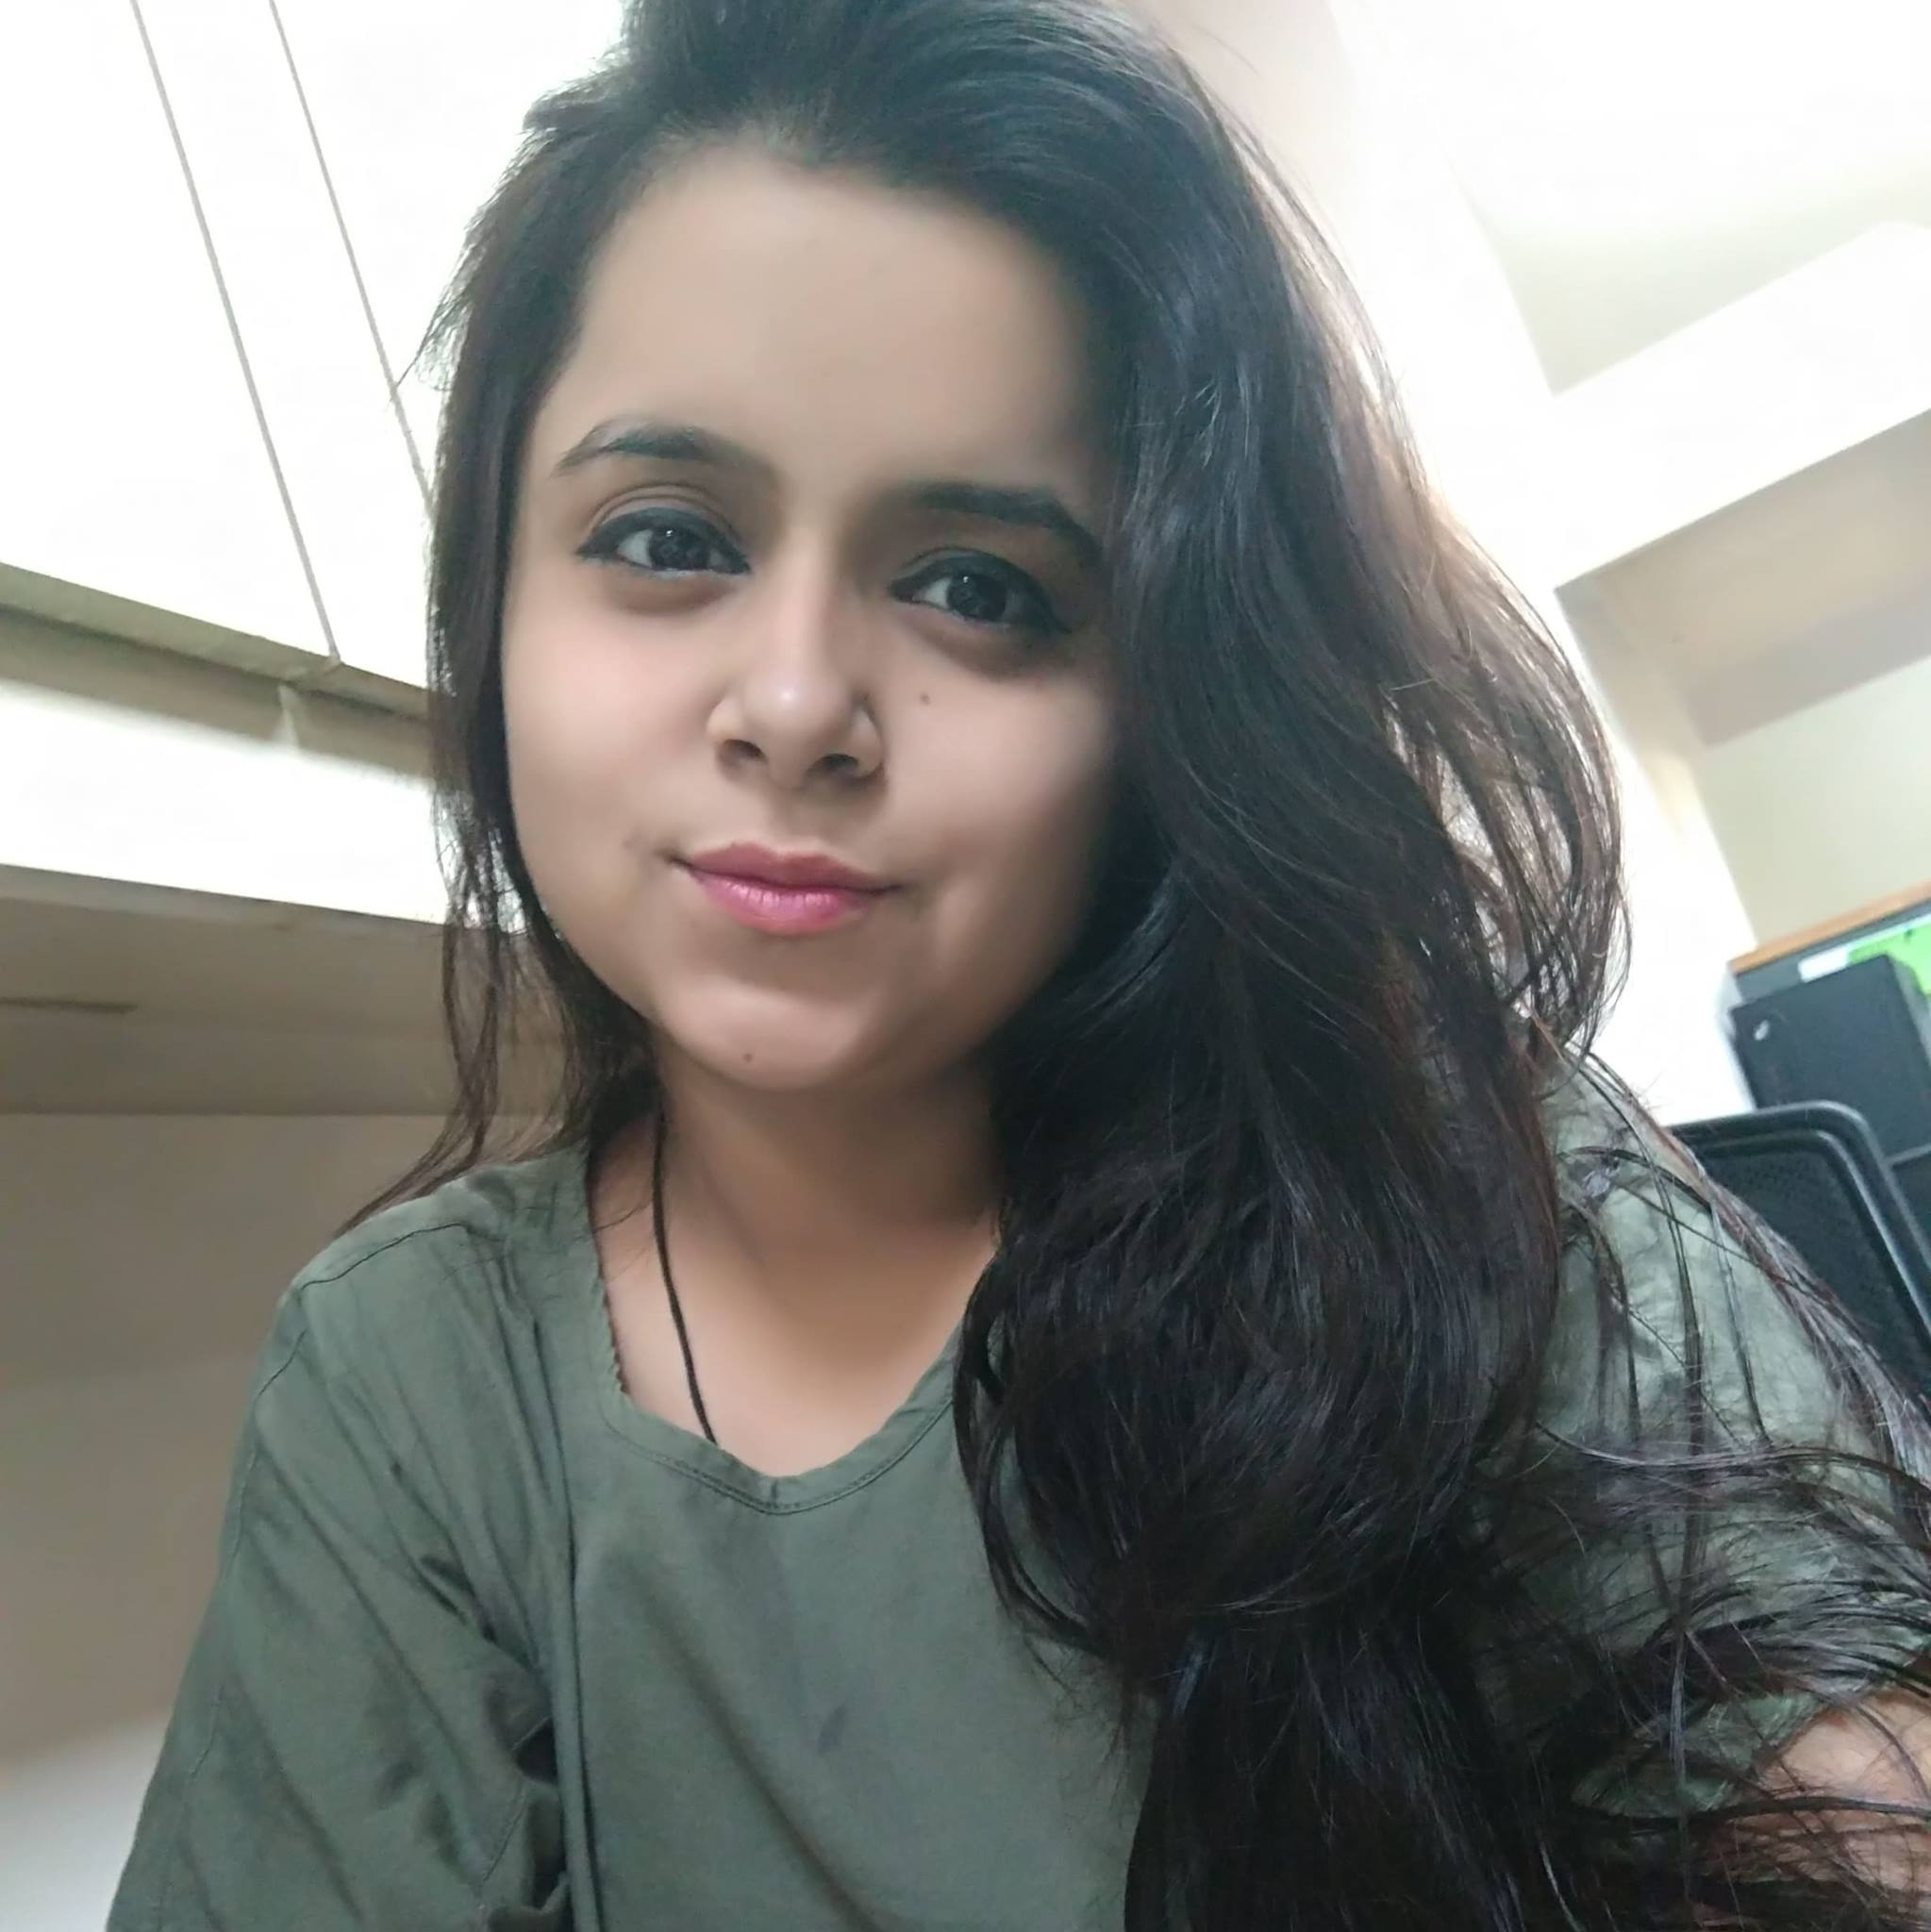 दीपाक्षी शर्मा